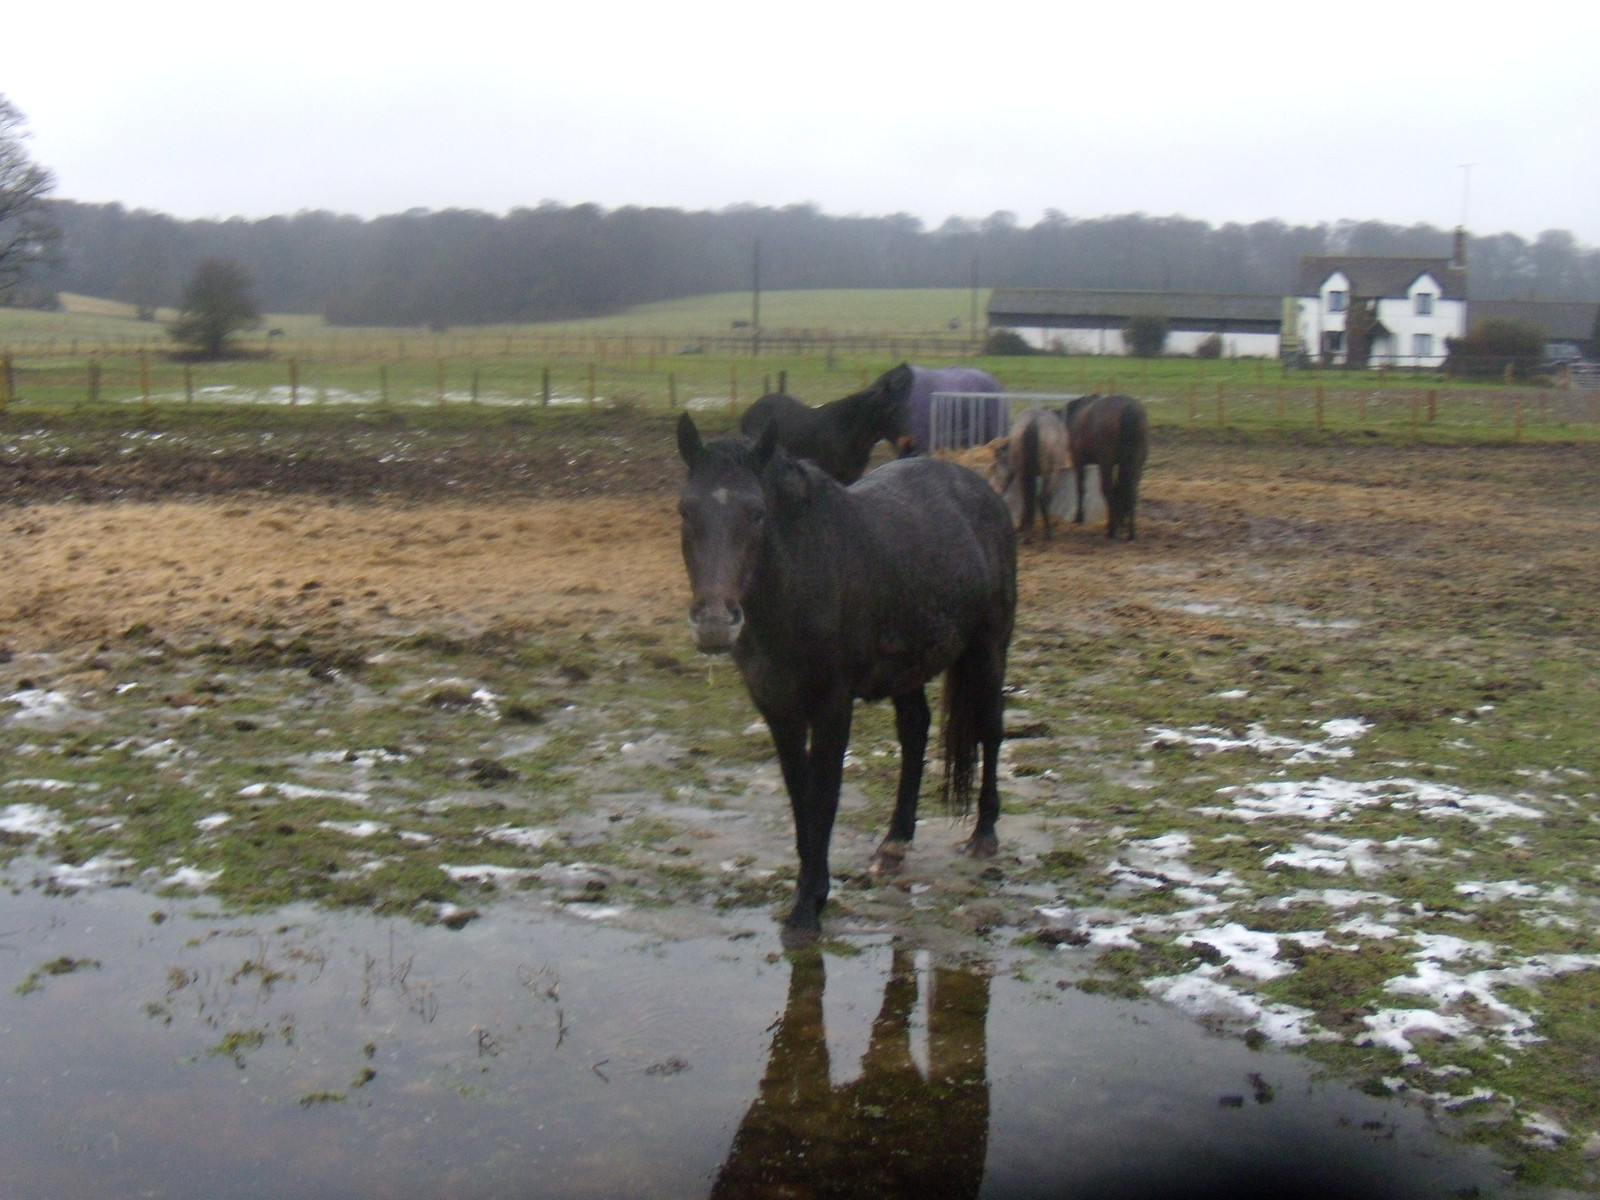 Horse DSCN8586 Chorleywood to Chesham